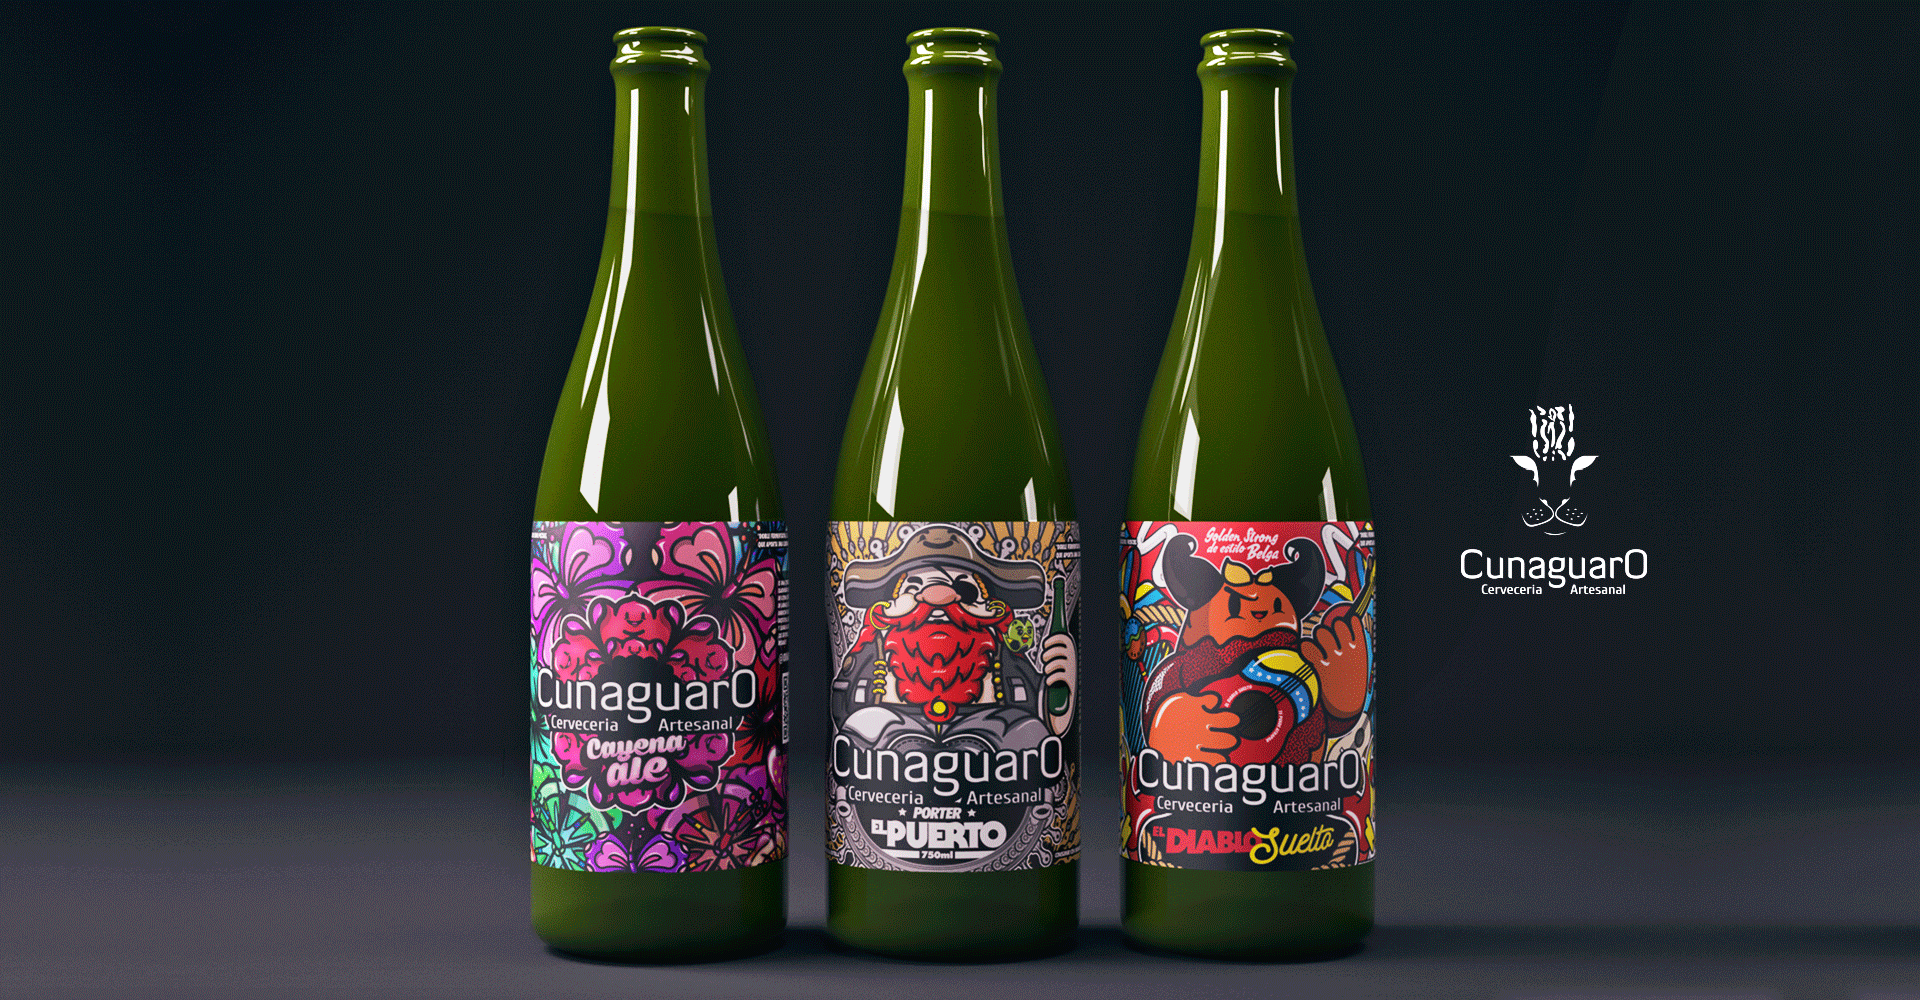 cunaguaro-beer-chocotoy-1.png